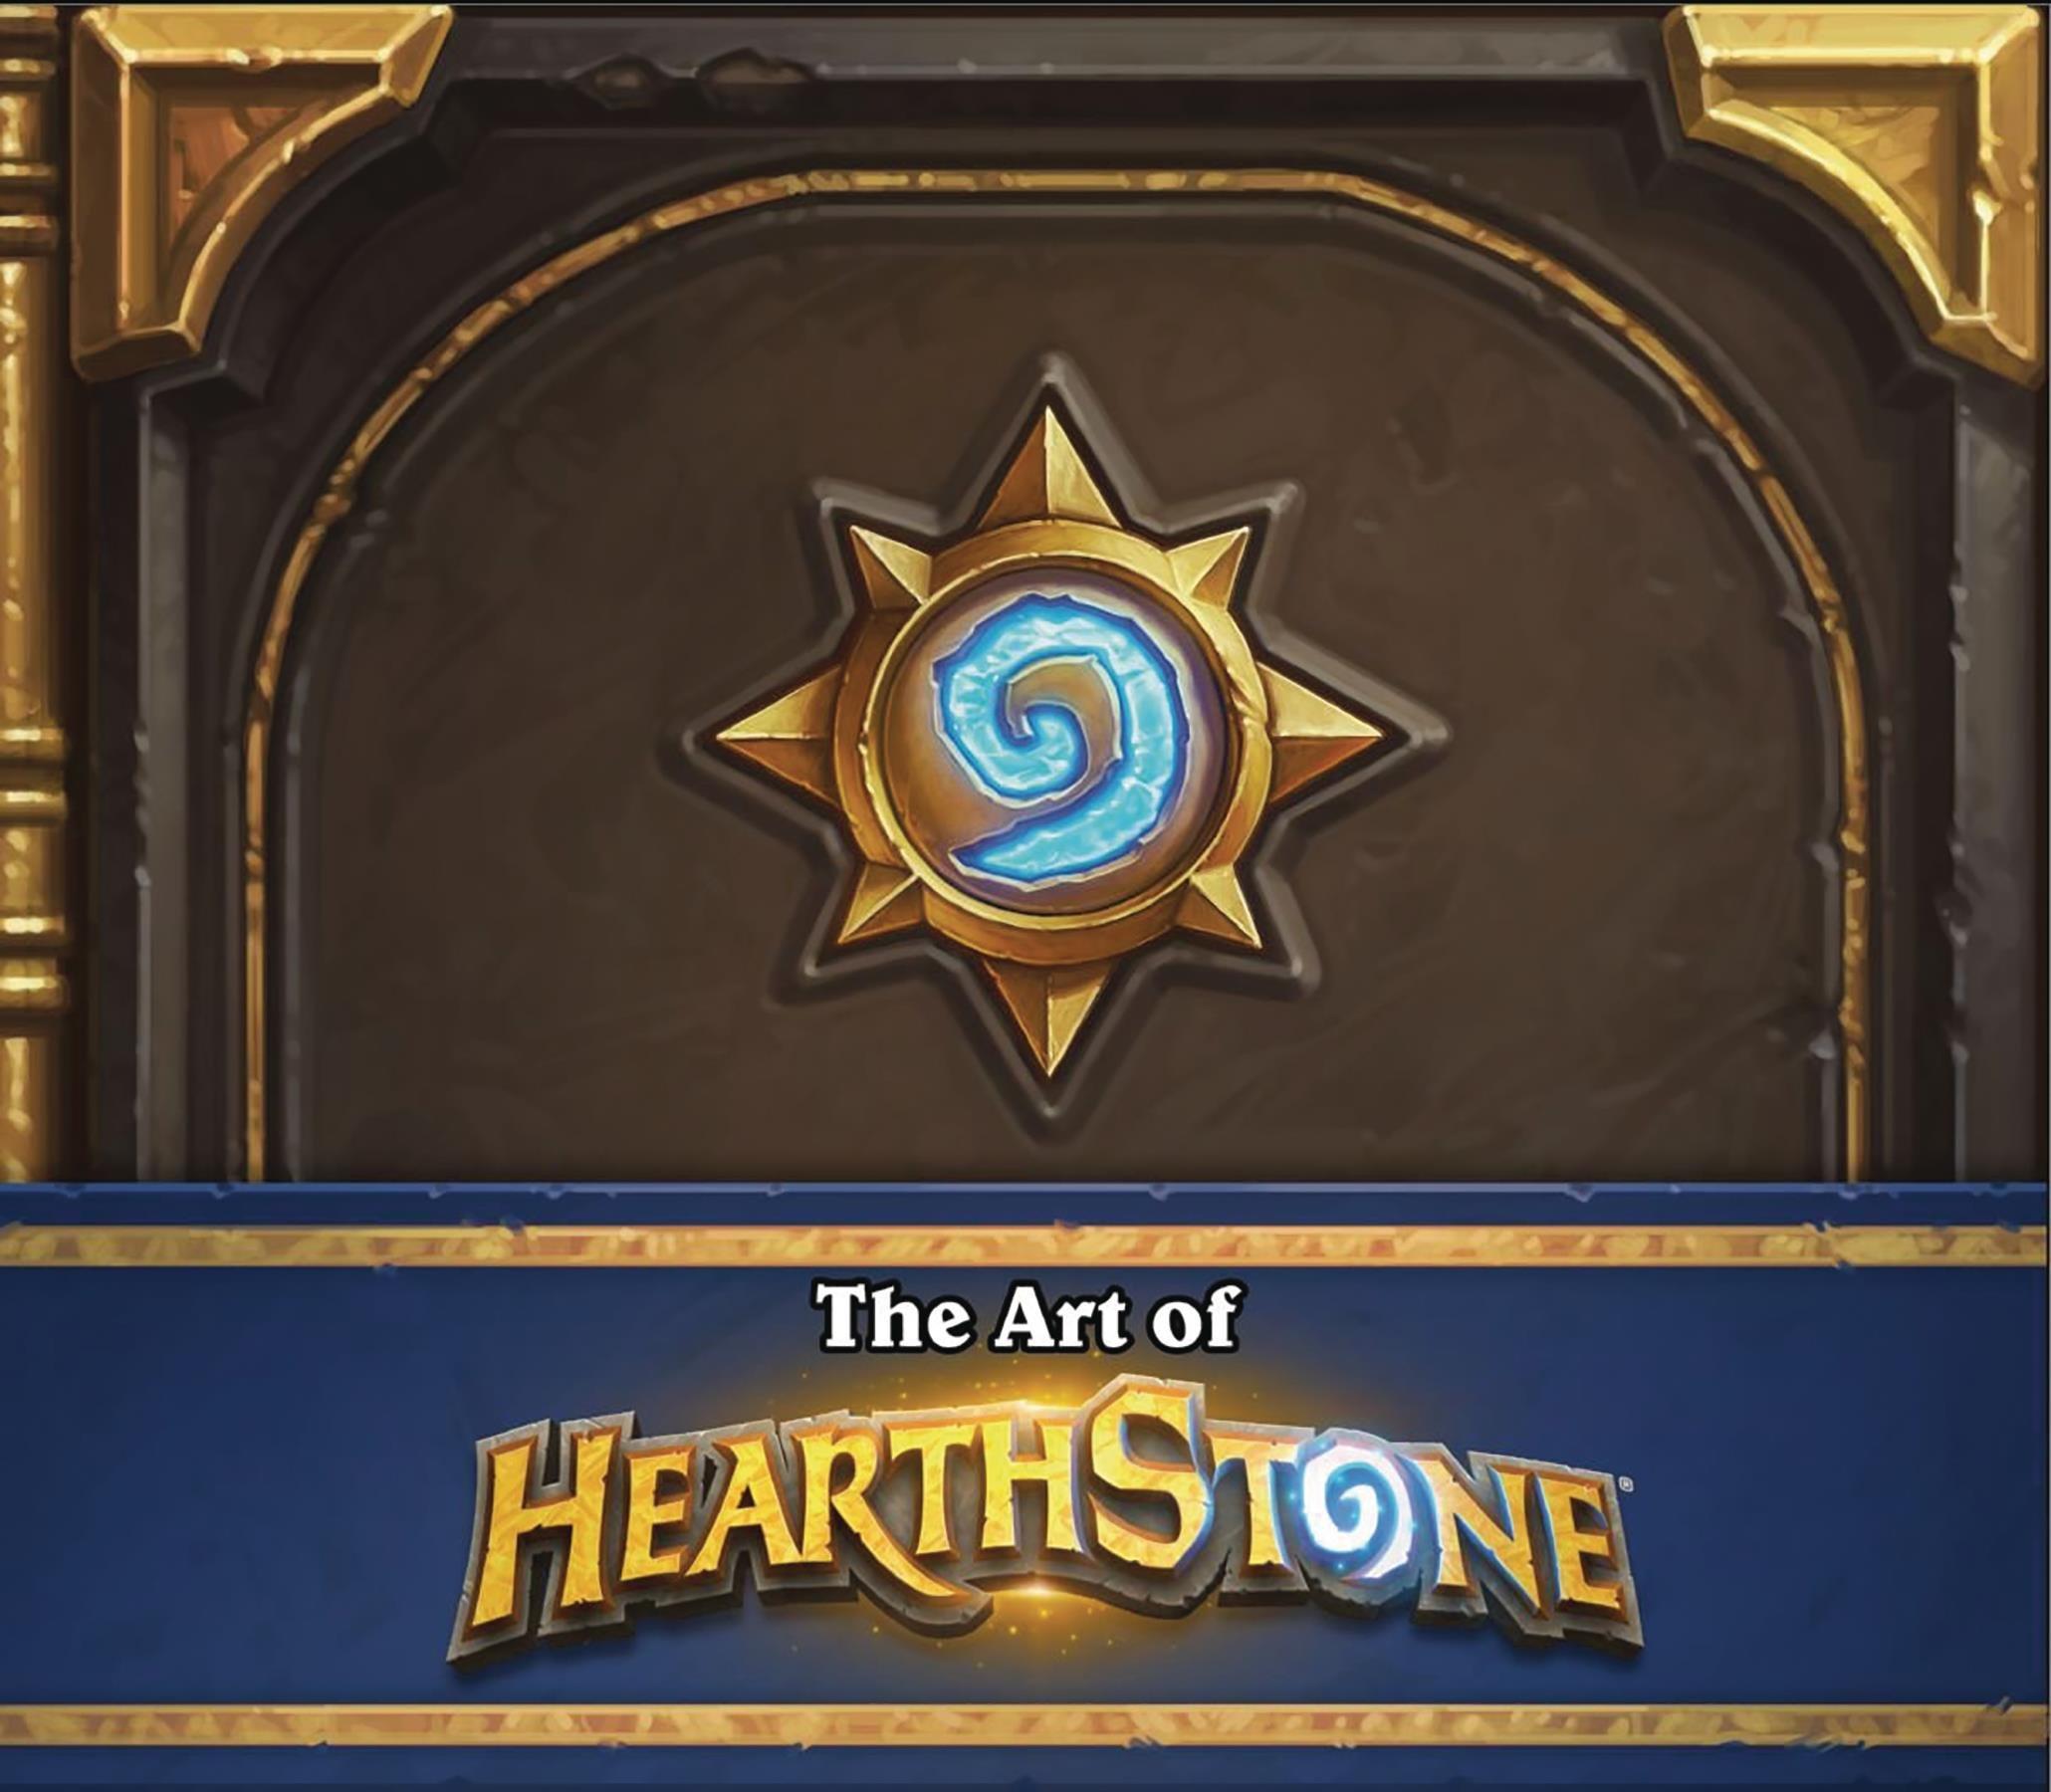 Hearthstone - The Art of Hearthstone